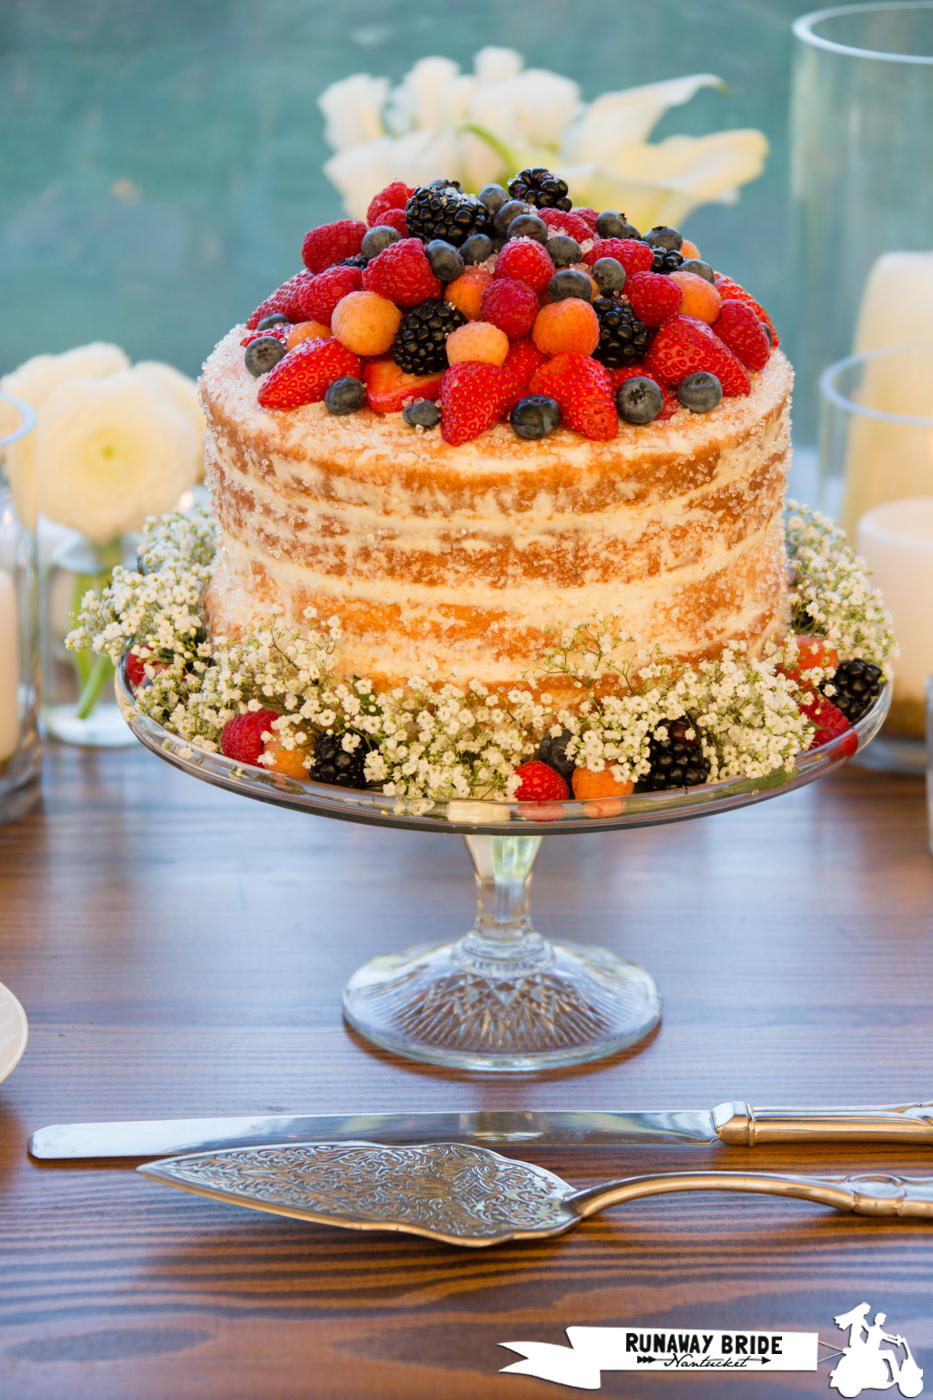 Naked Cake by Nantucket Cake Company